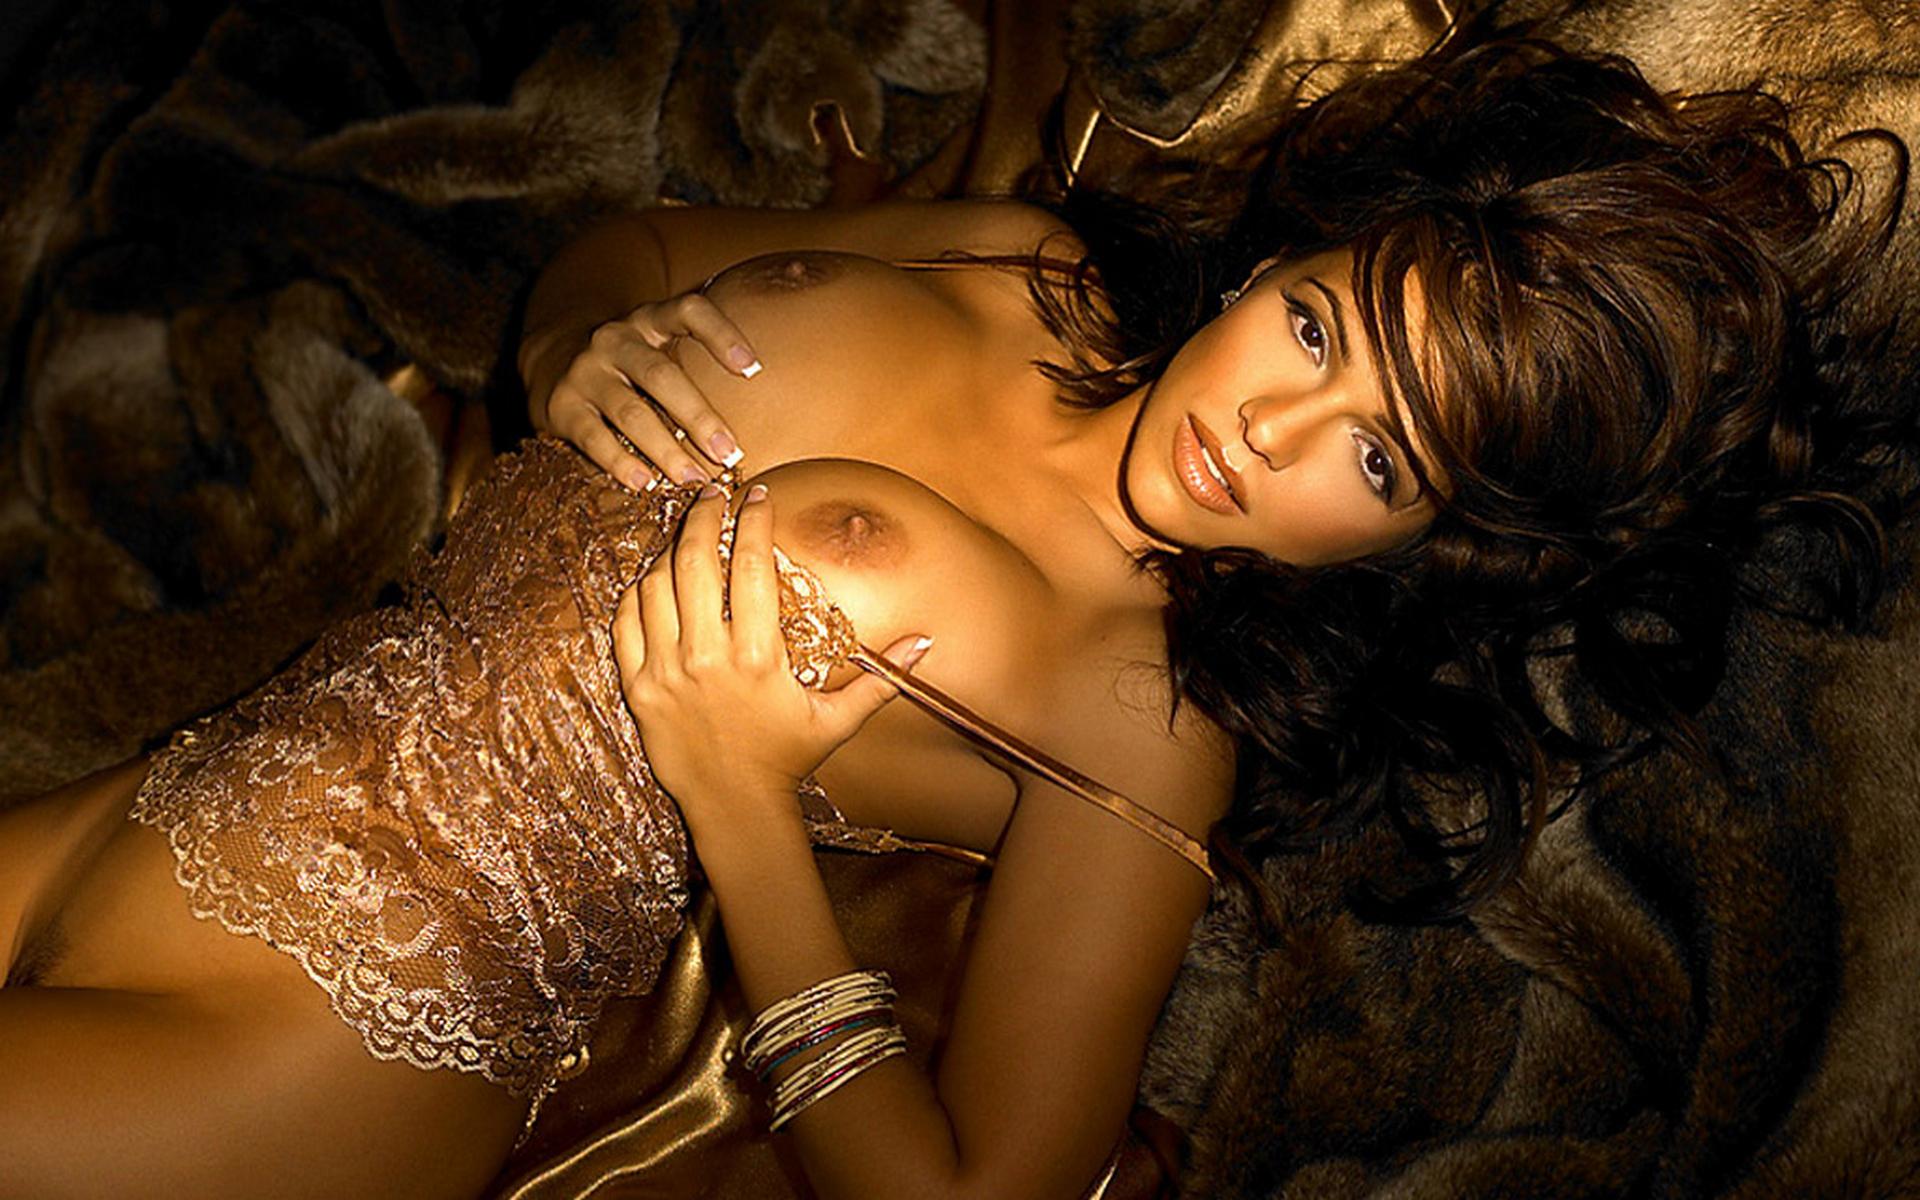 Деревенский секси фото нефтекамских девушек невесту